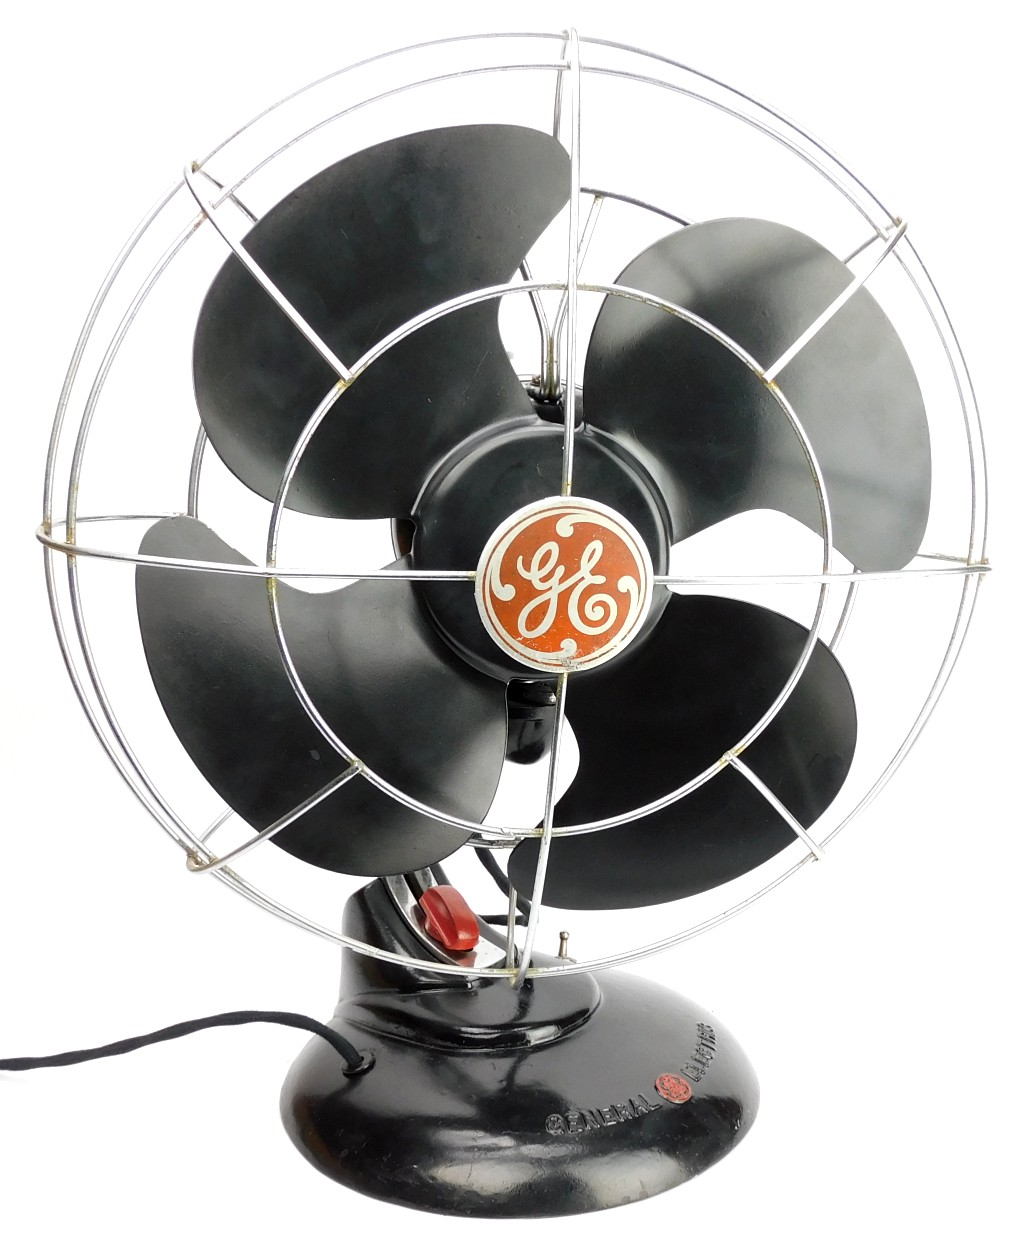 "Circa 1941 GE 12"" Desk Fan Model FM12S1"